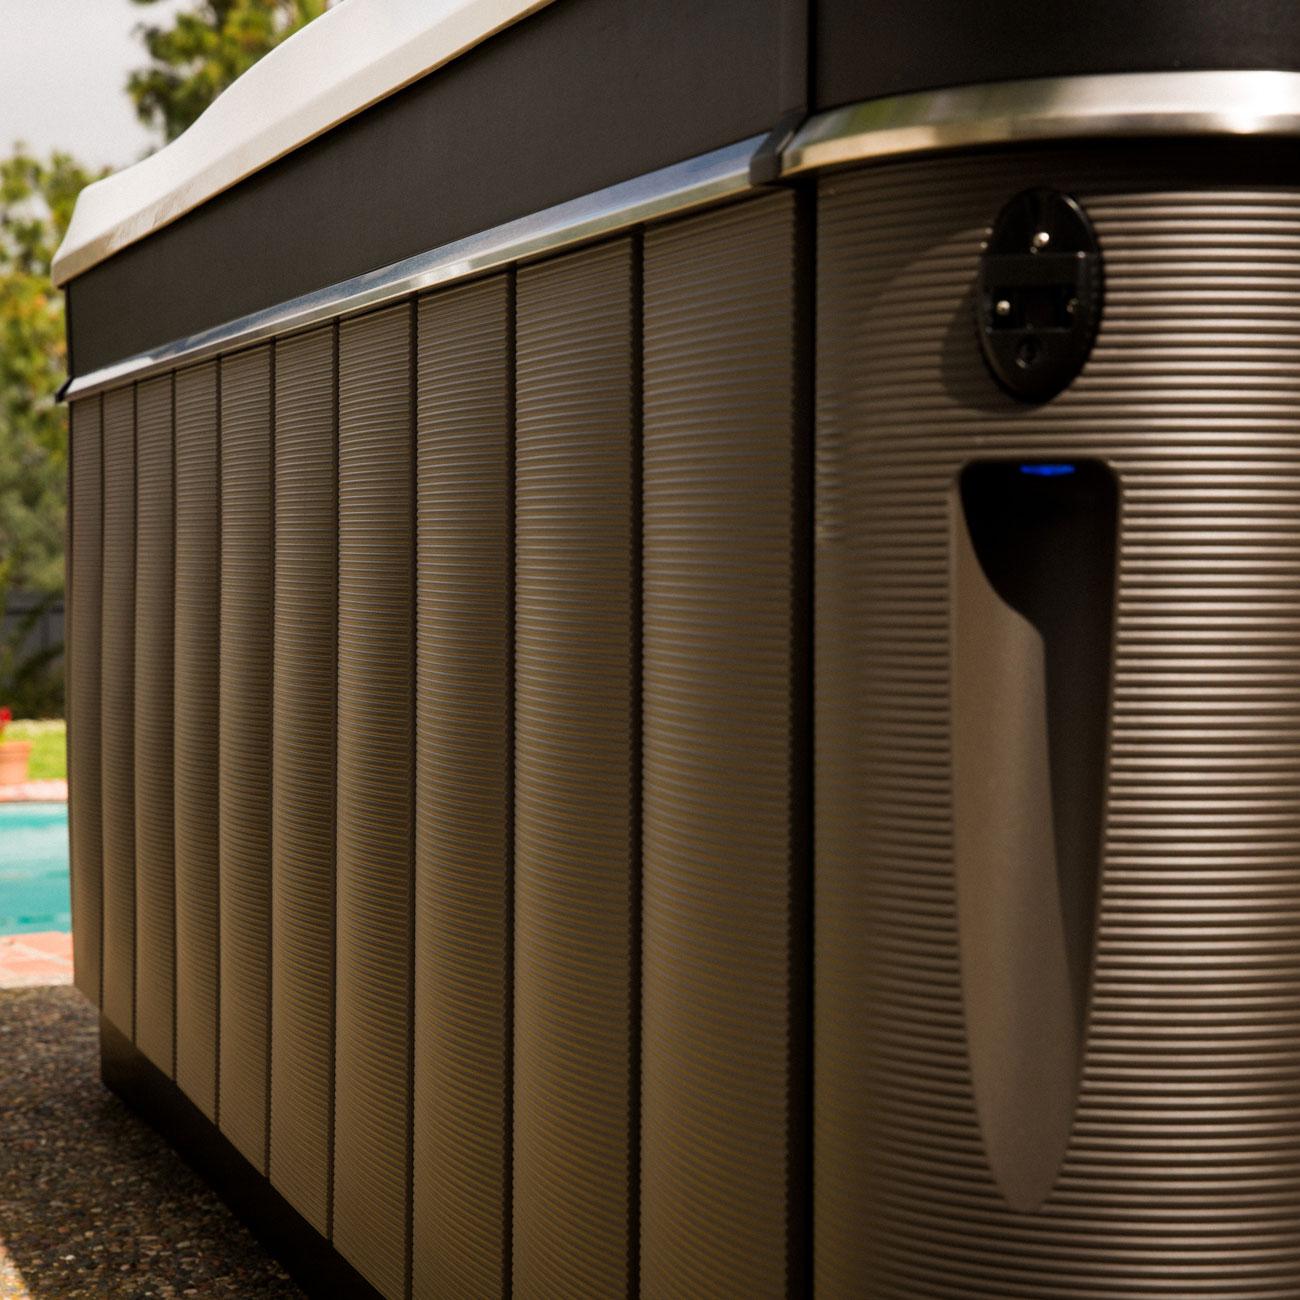 Caldera Spa Geneva Model 6 Person Luxury Outdoor Living